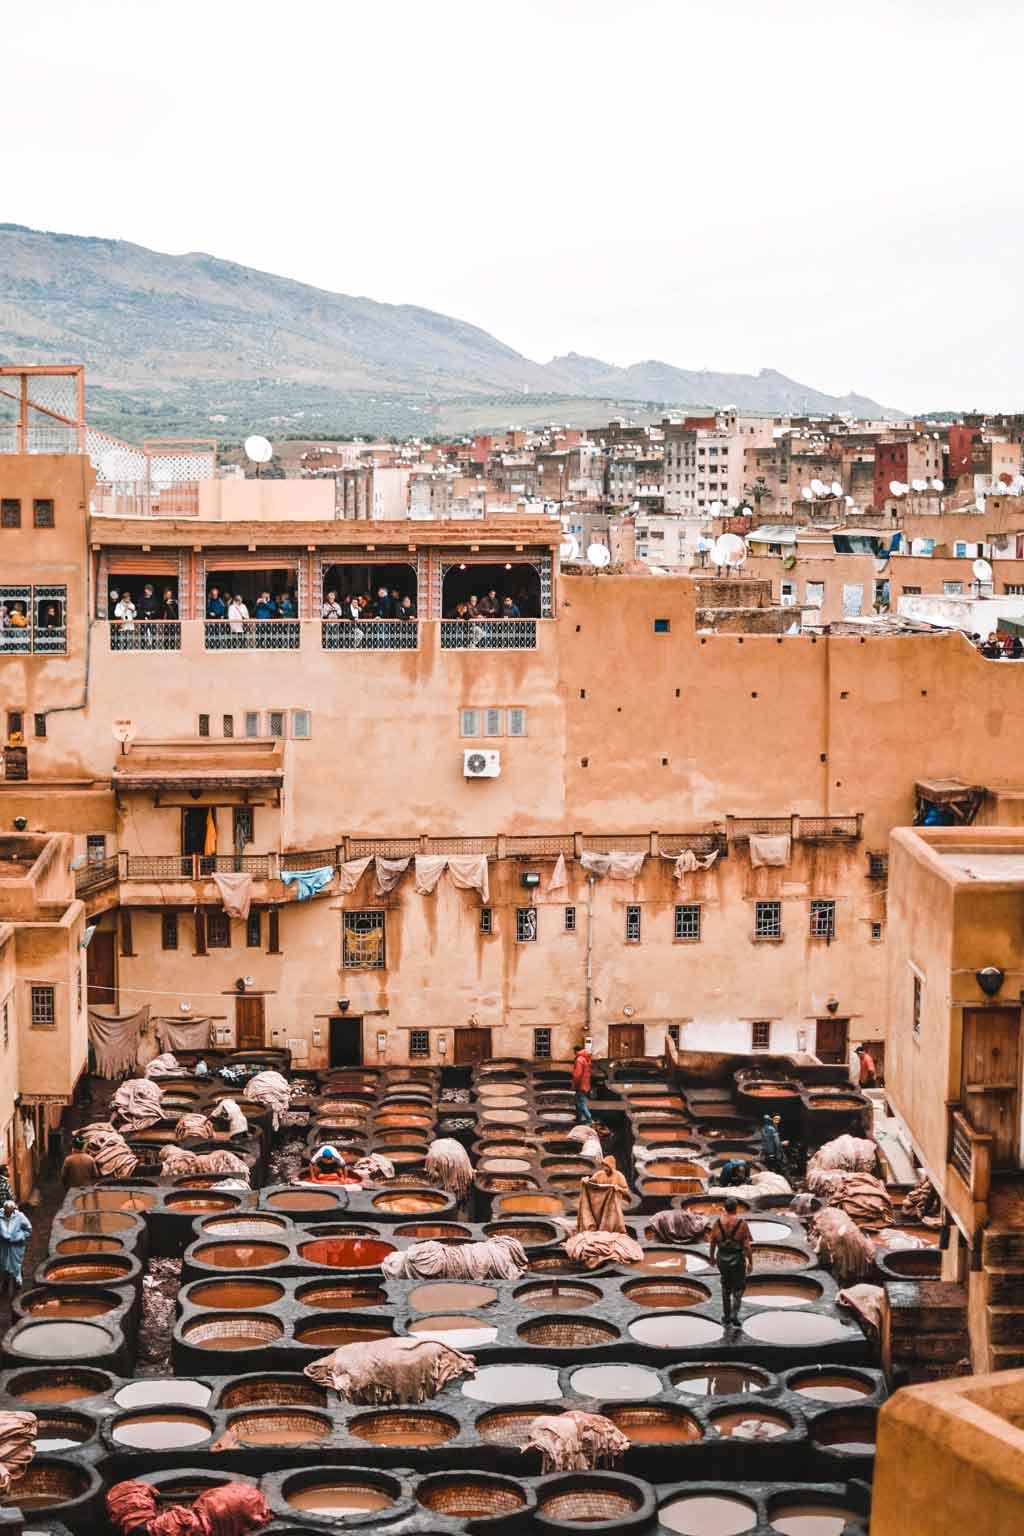 Geberei in Marrakesch